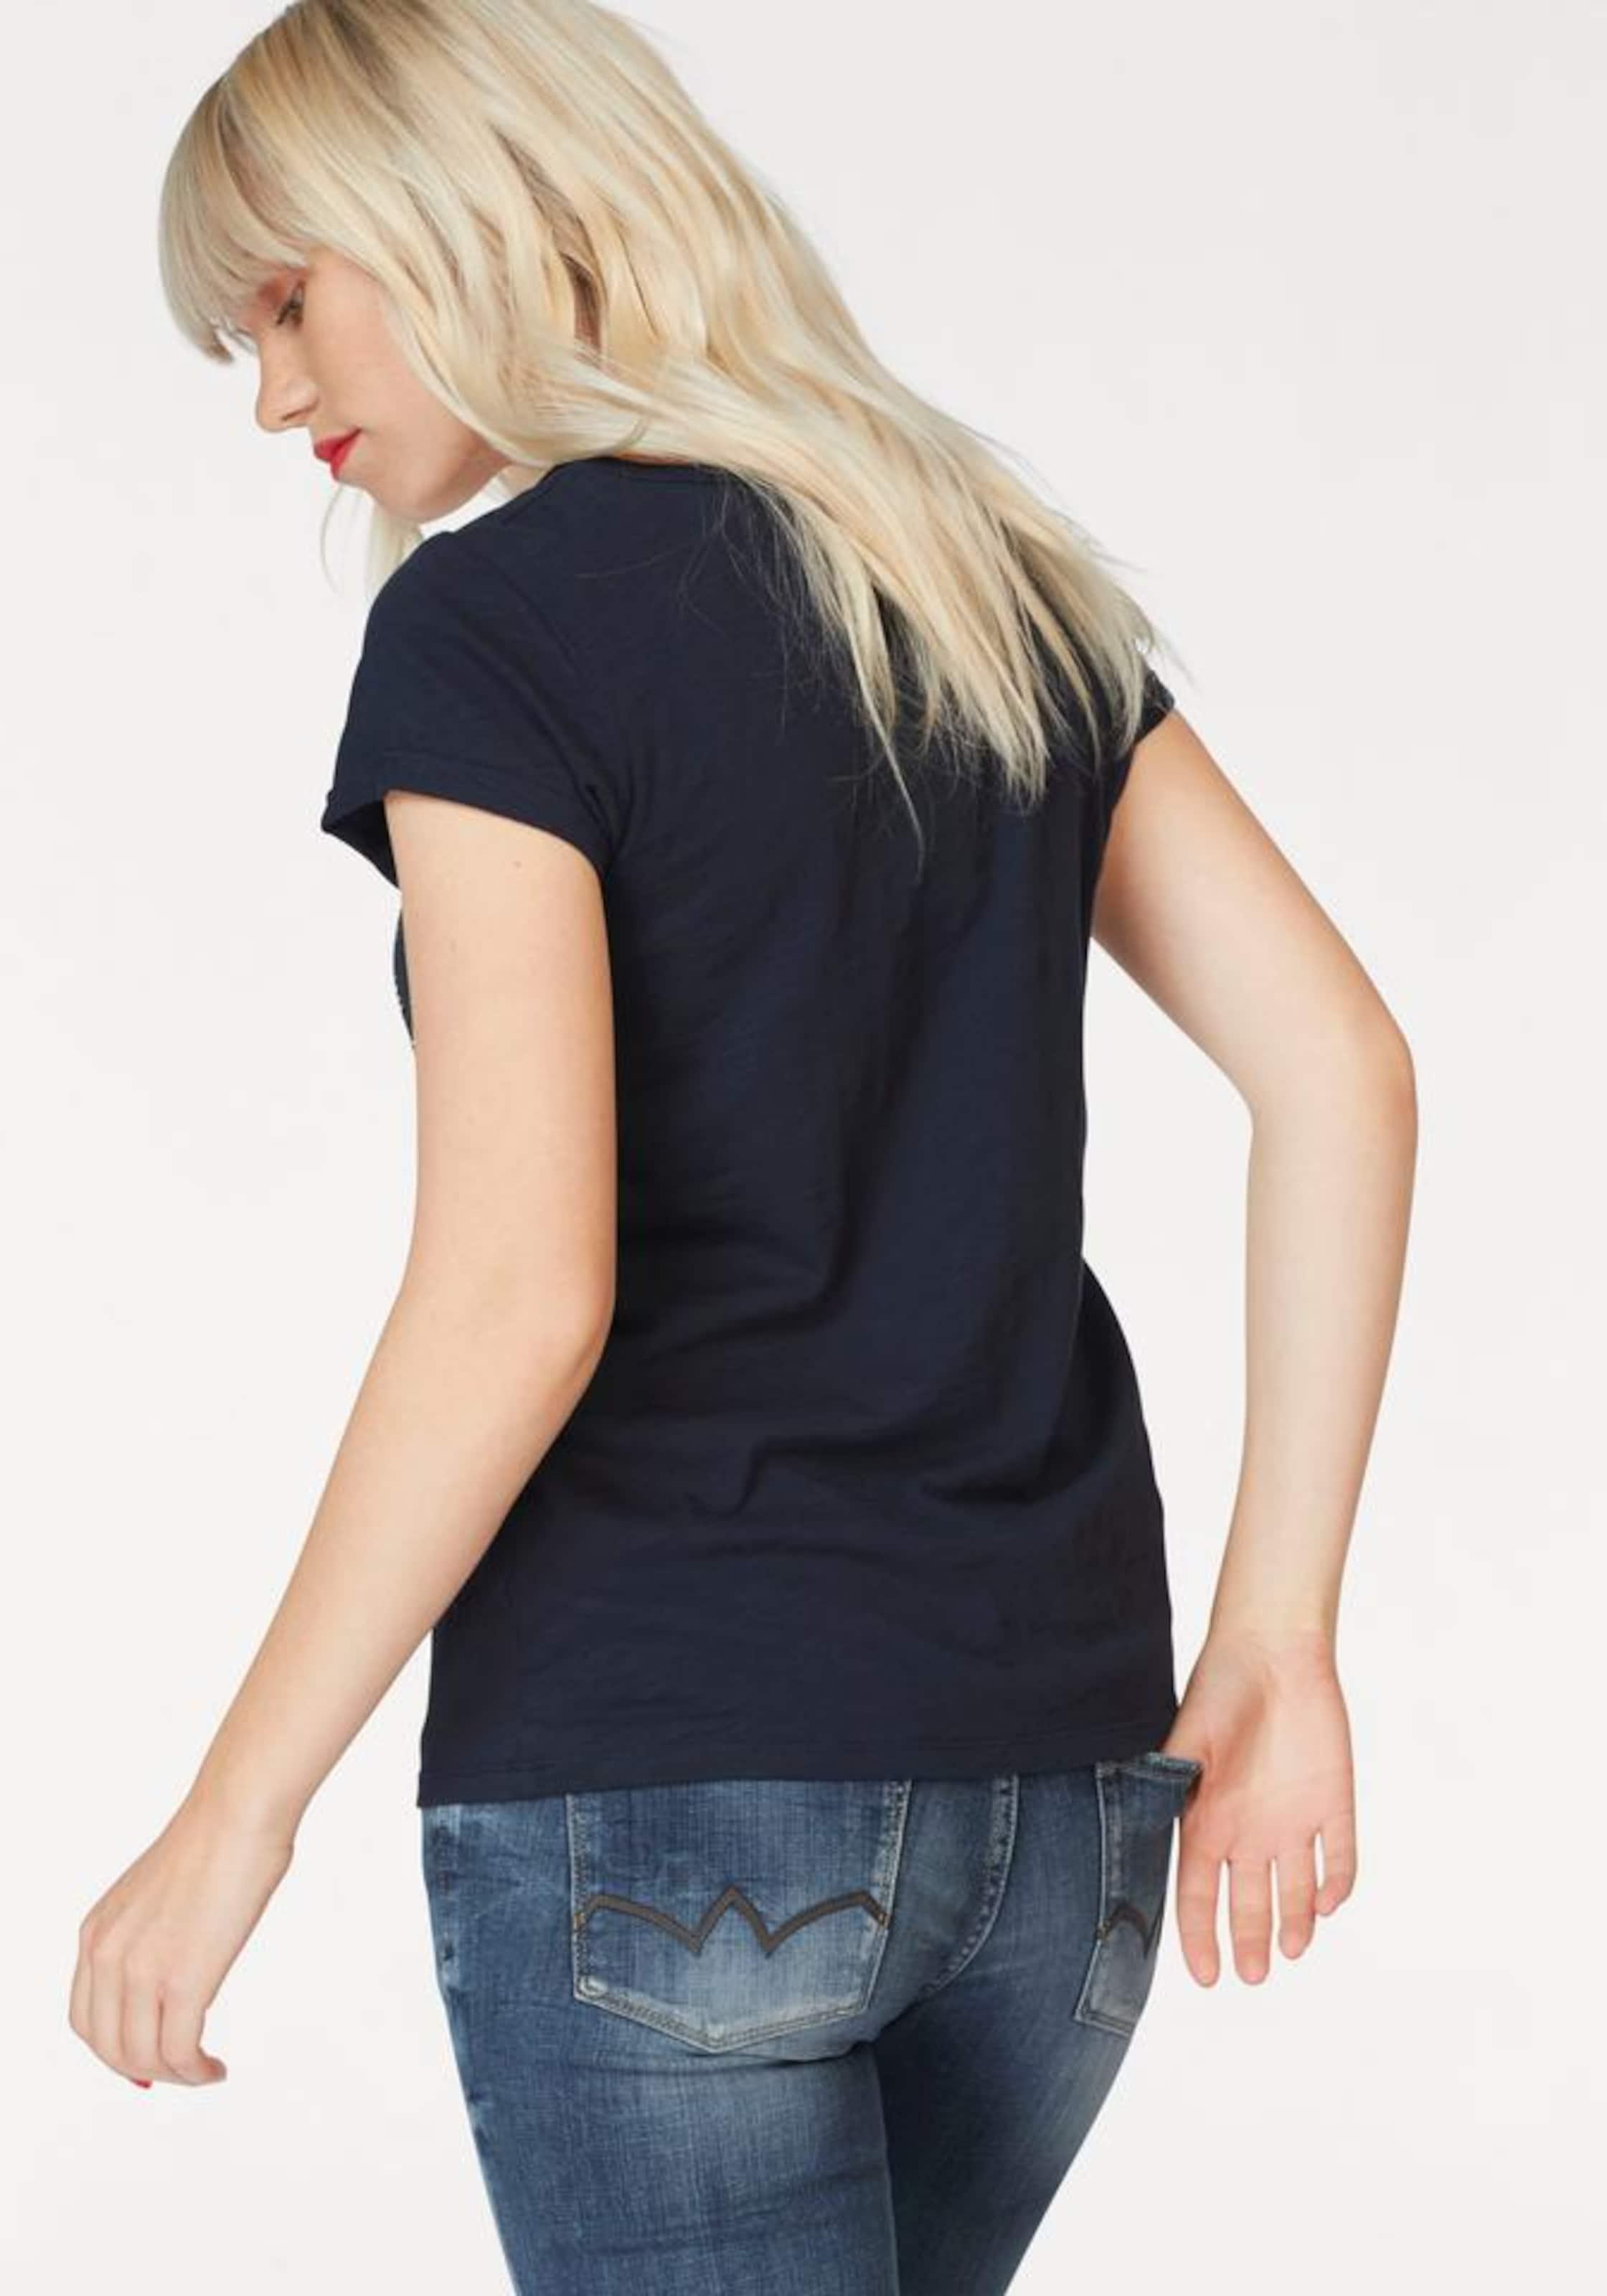 Le Temps Des Cerises T-Shirt 'GLITTER' Verkauf Größten Lieferanten ayXPN1